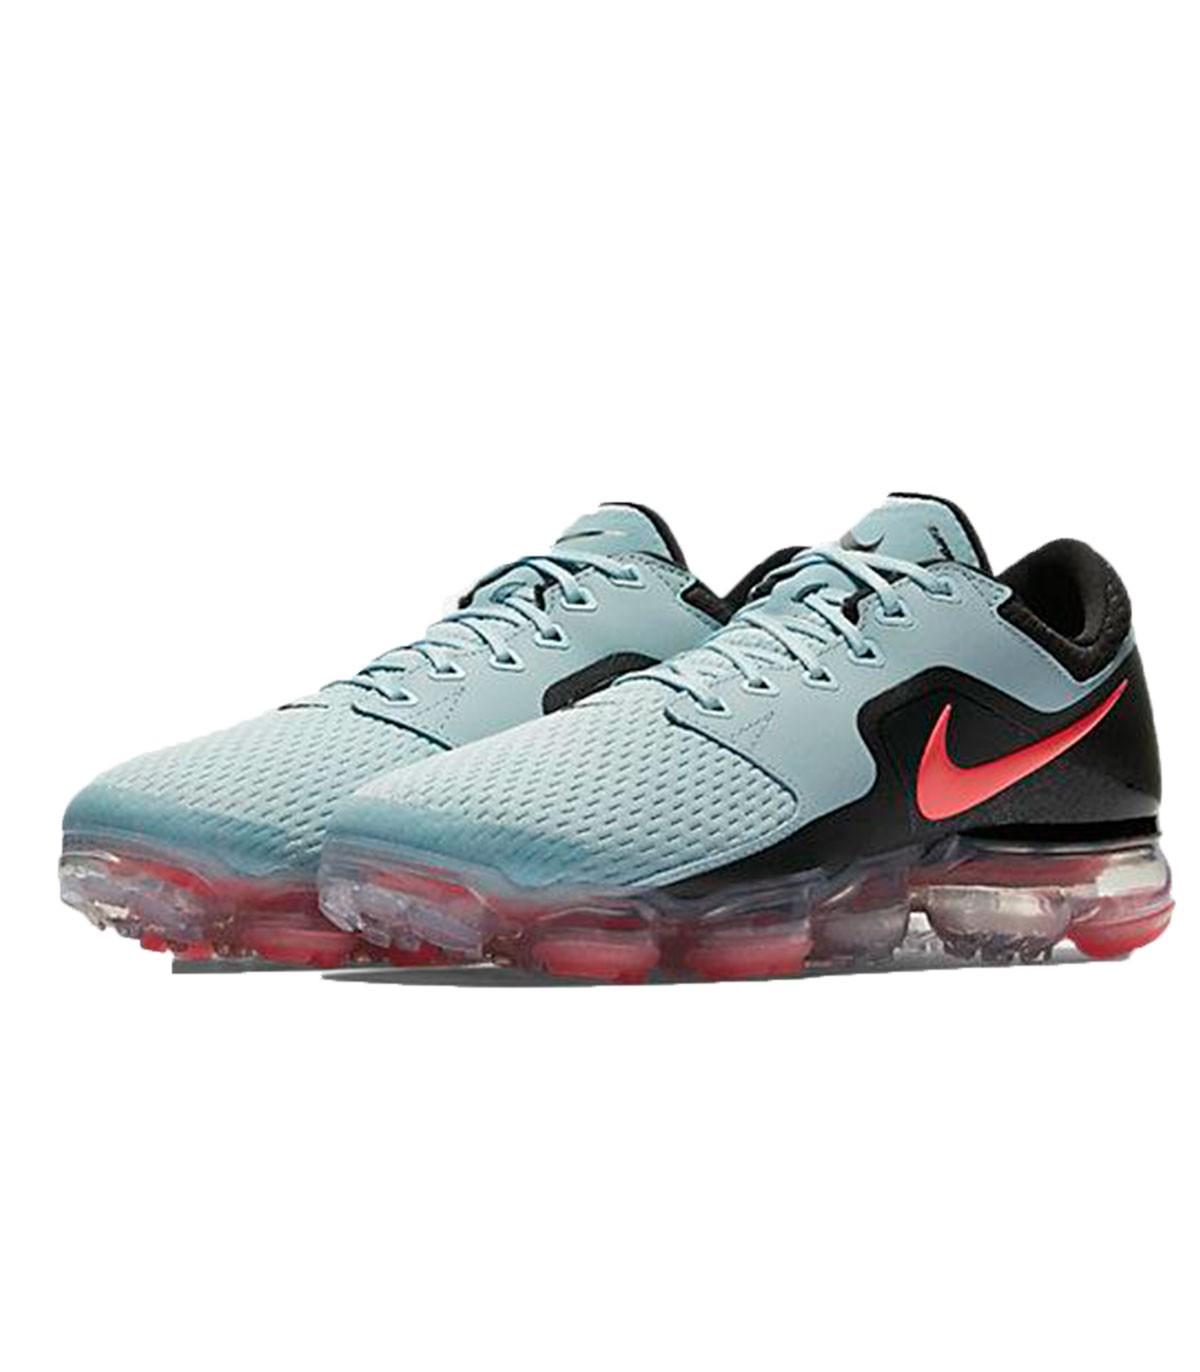 5f2541a031c6 Buy Nike Air Vapormax